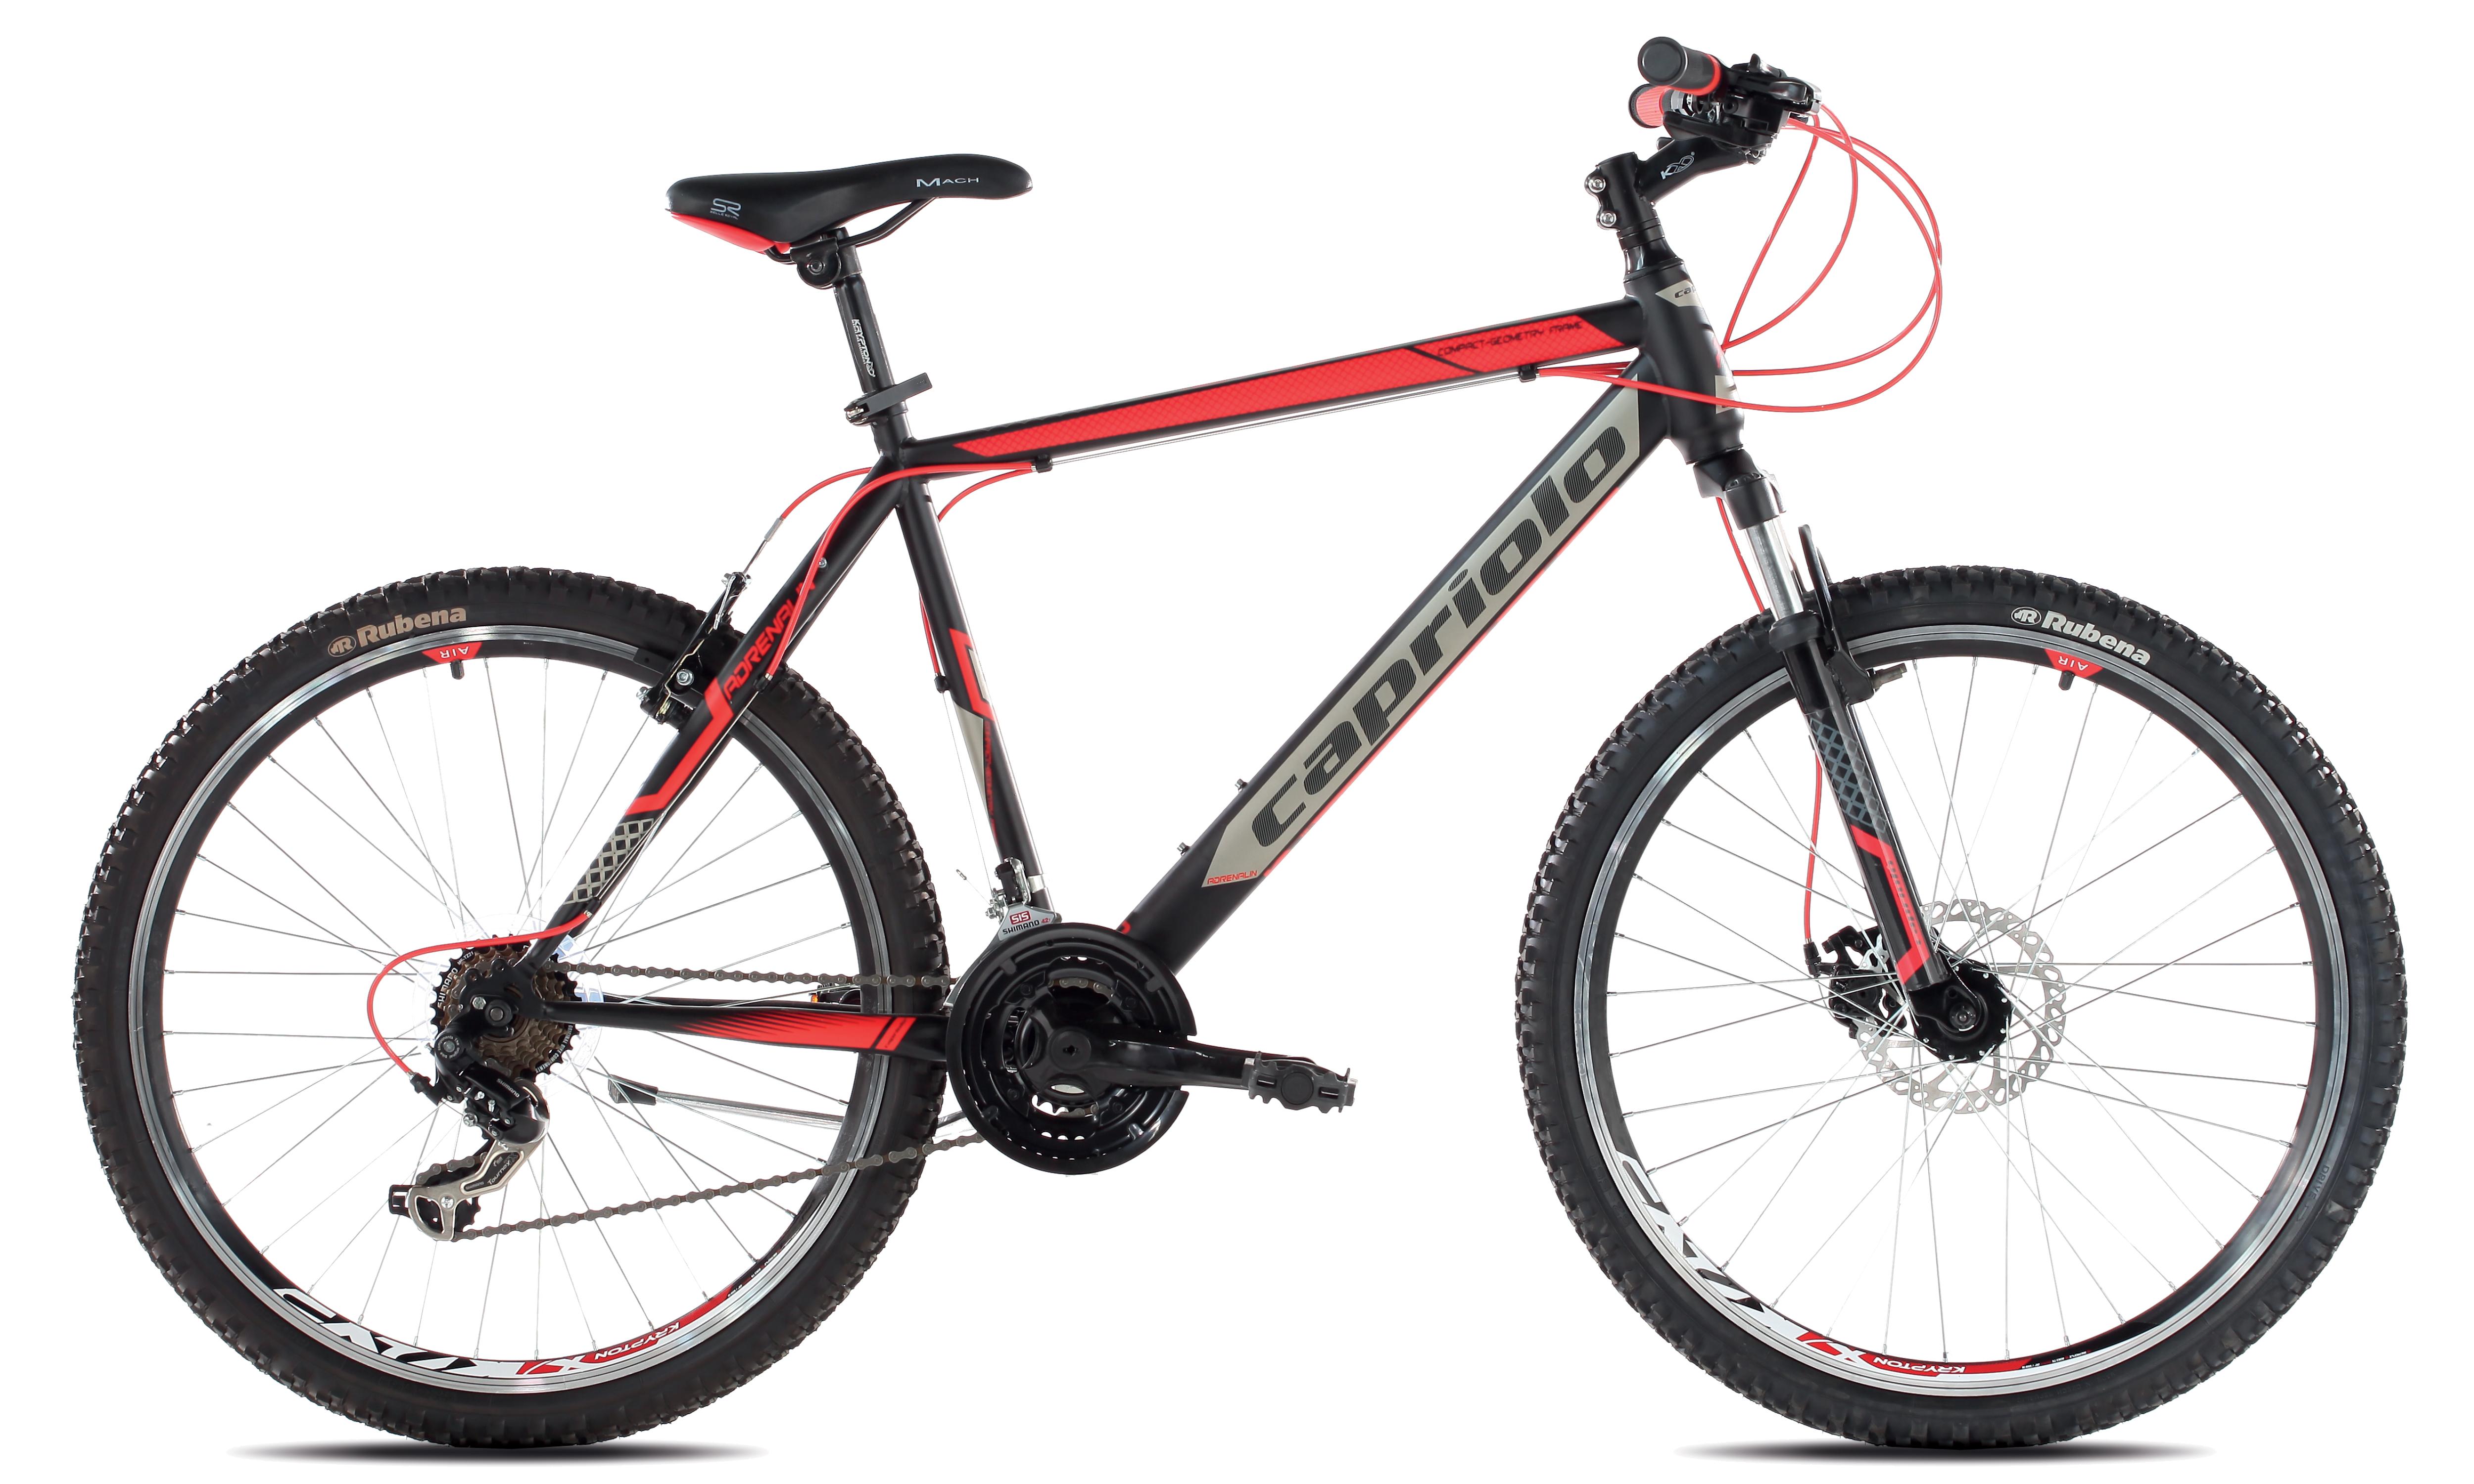 bicikl-capriolo-adrenalin-26-crveno-crna-2016-20